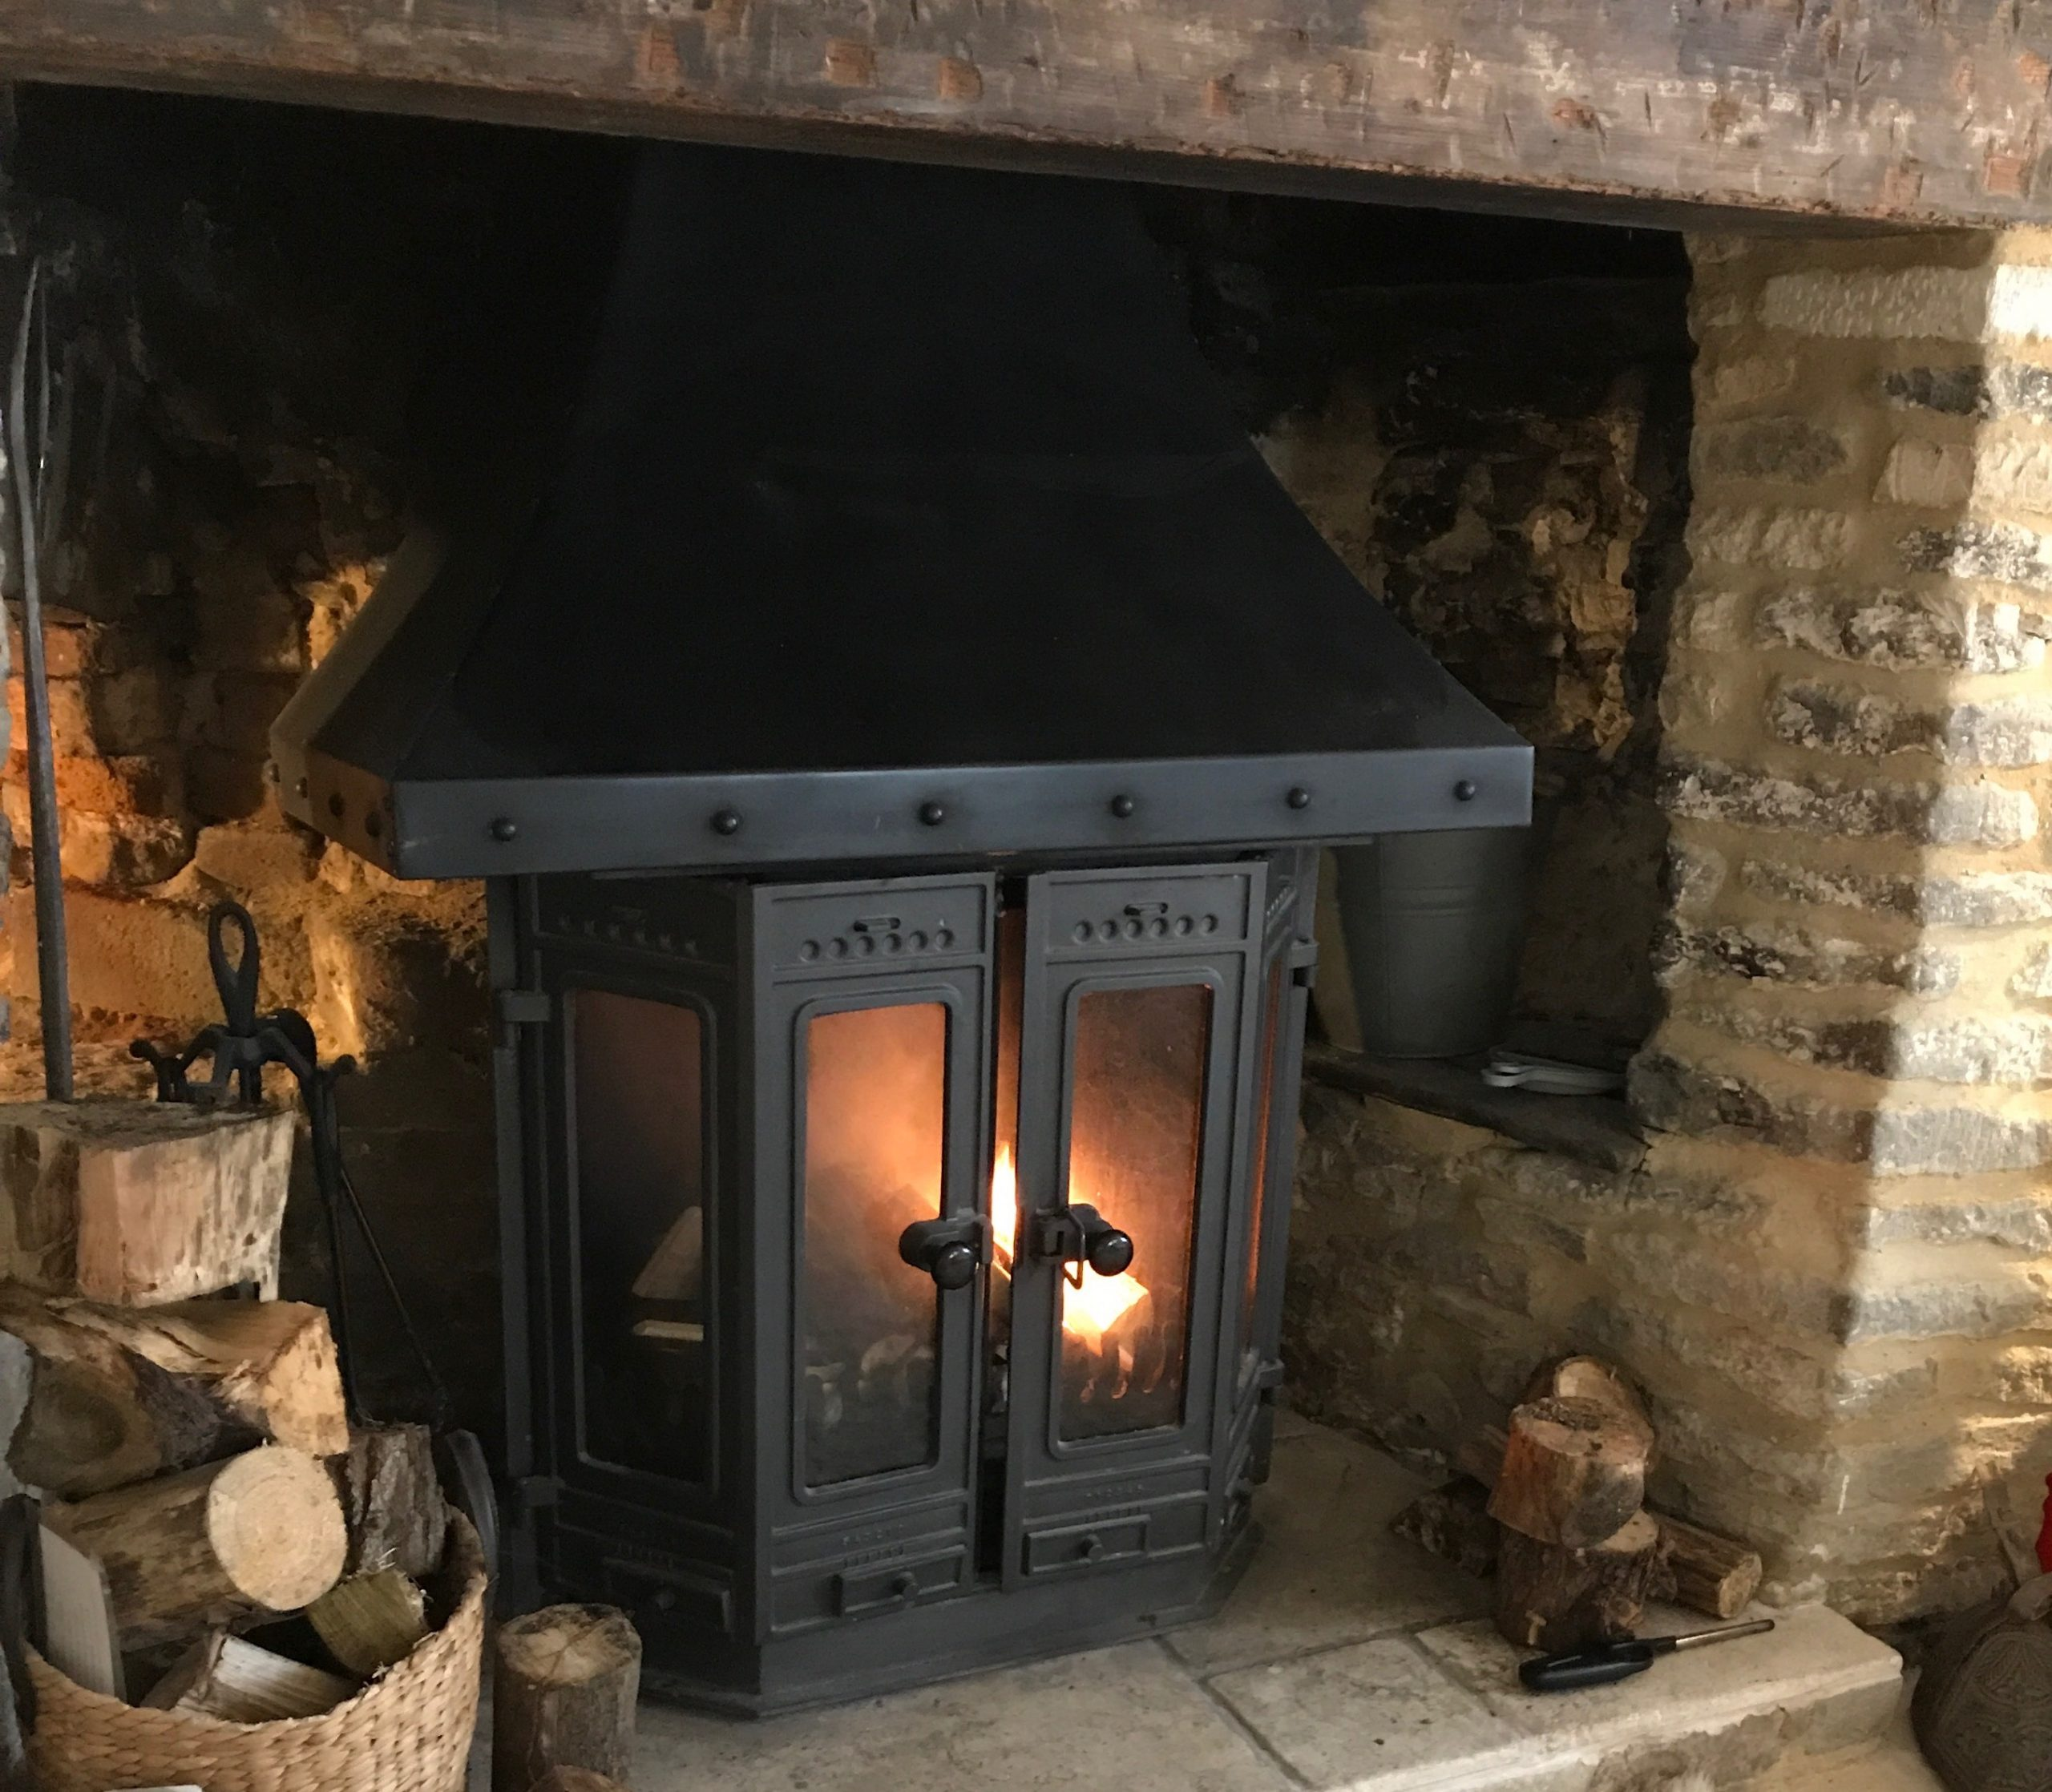 The inglenook fireplace